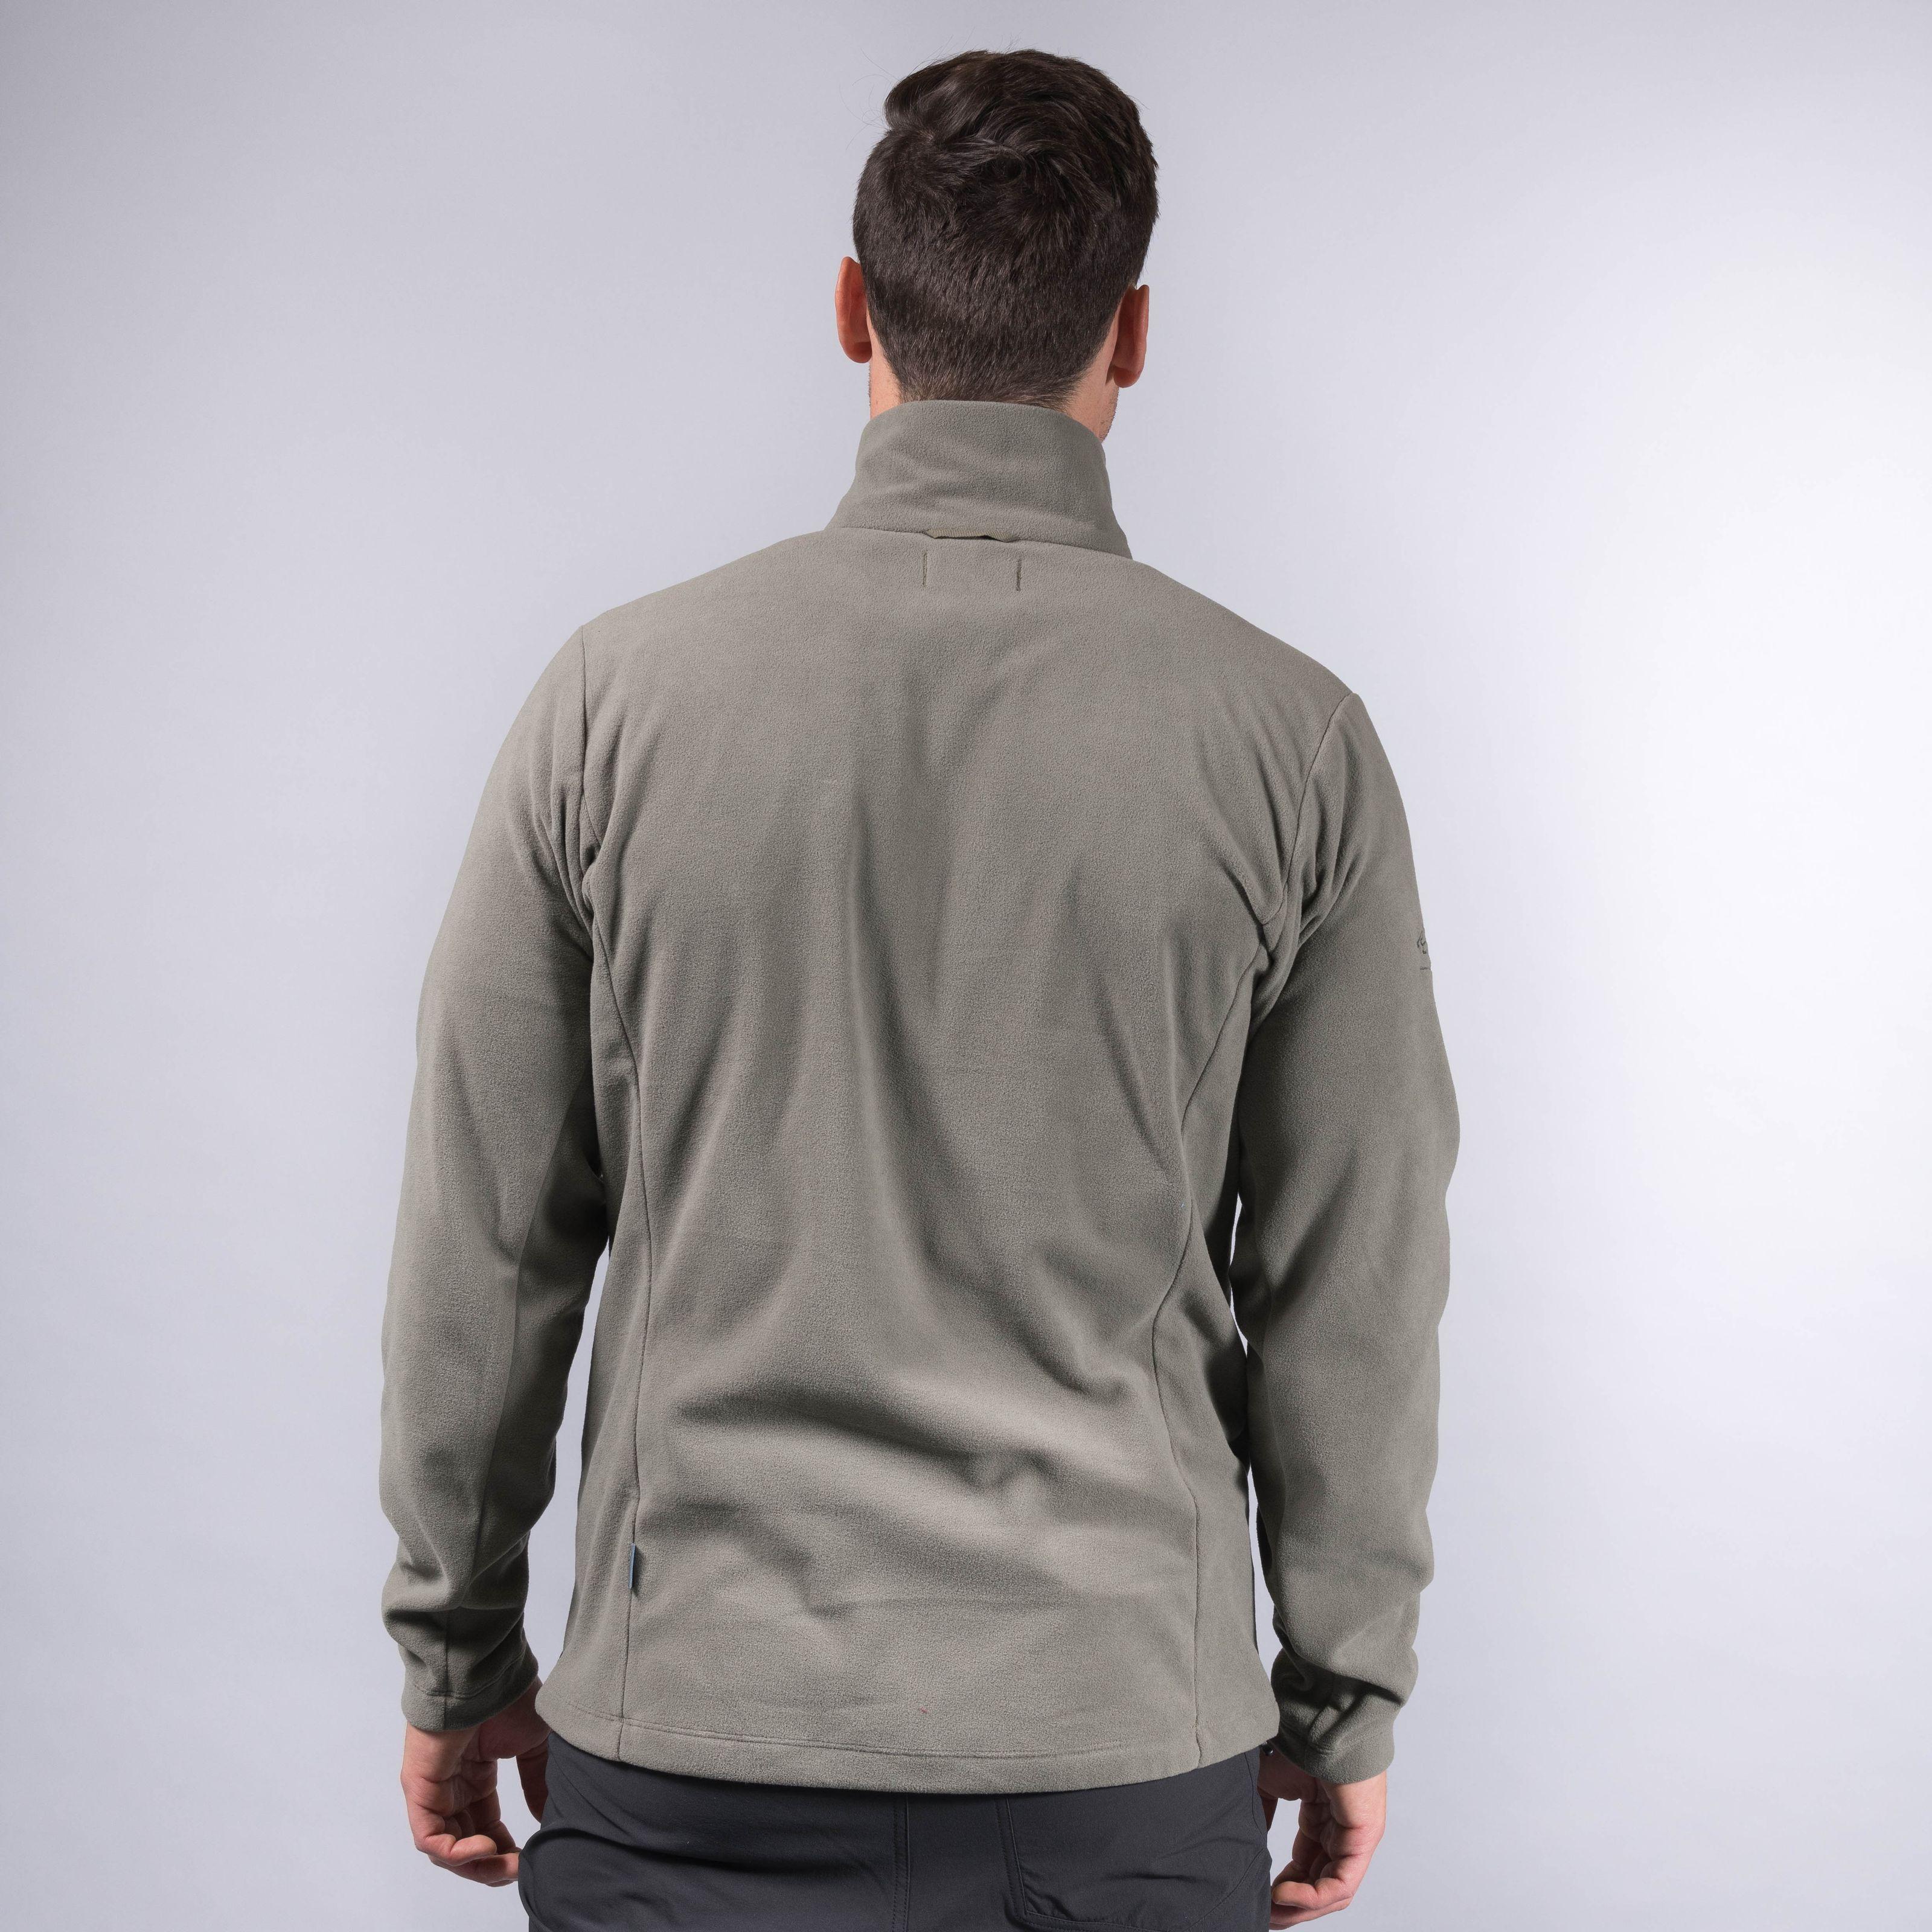 Bergans Finnsnes Fleece Jacket Herre | SportsDeal